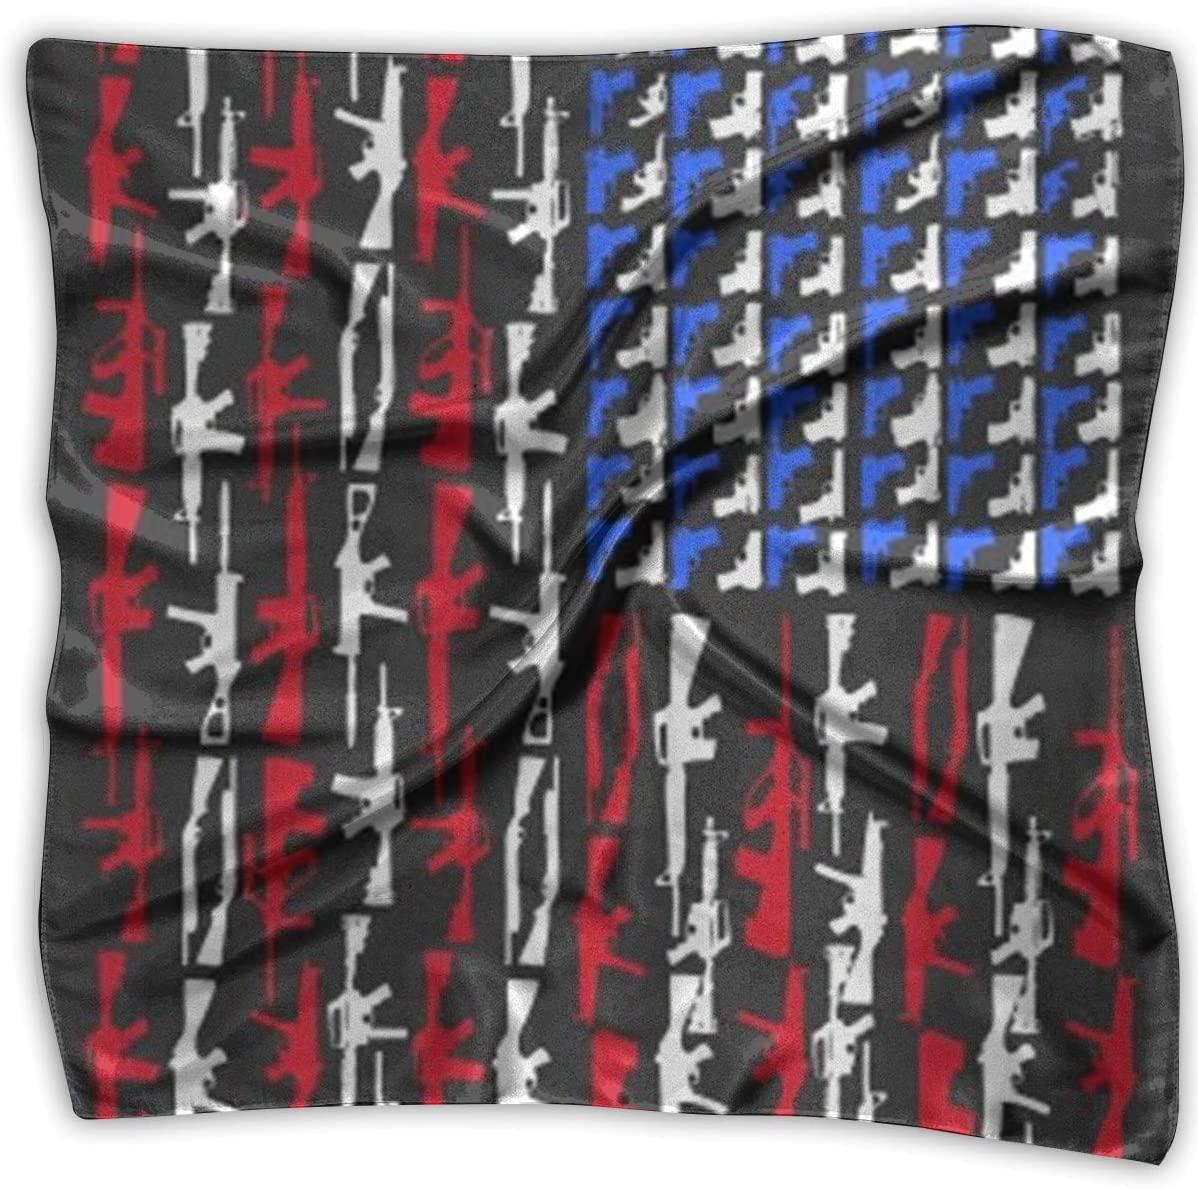 WFIRE Gun American Flag Square Handkerchiefs Scarf Shawl Bandanas Headscarf Neckerchief Tie Hair Scarf